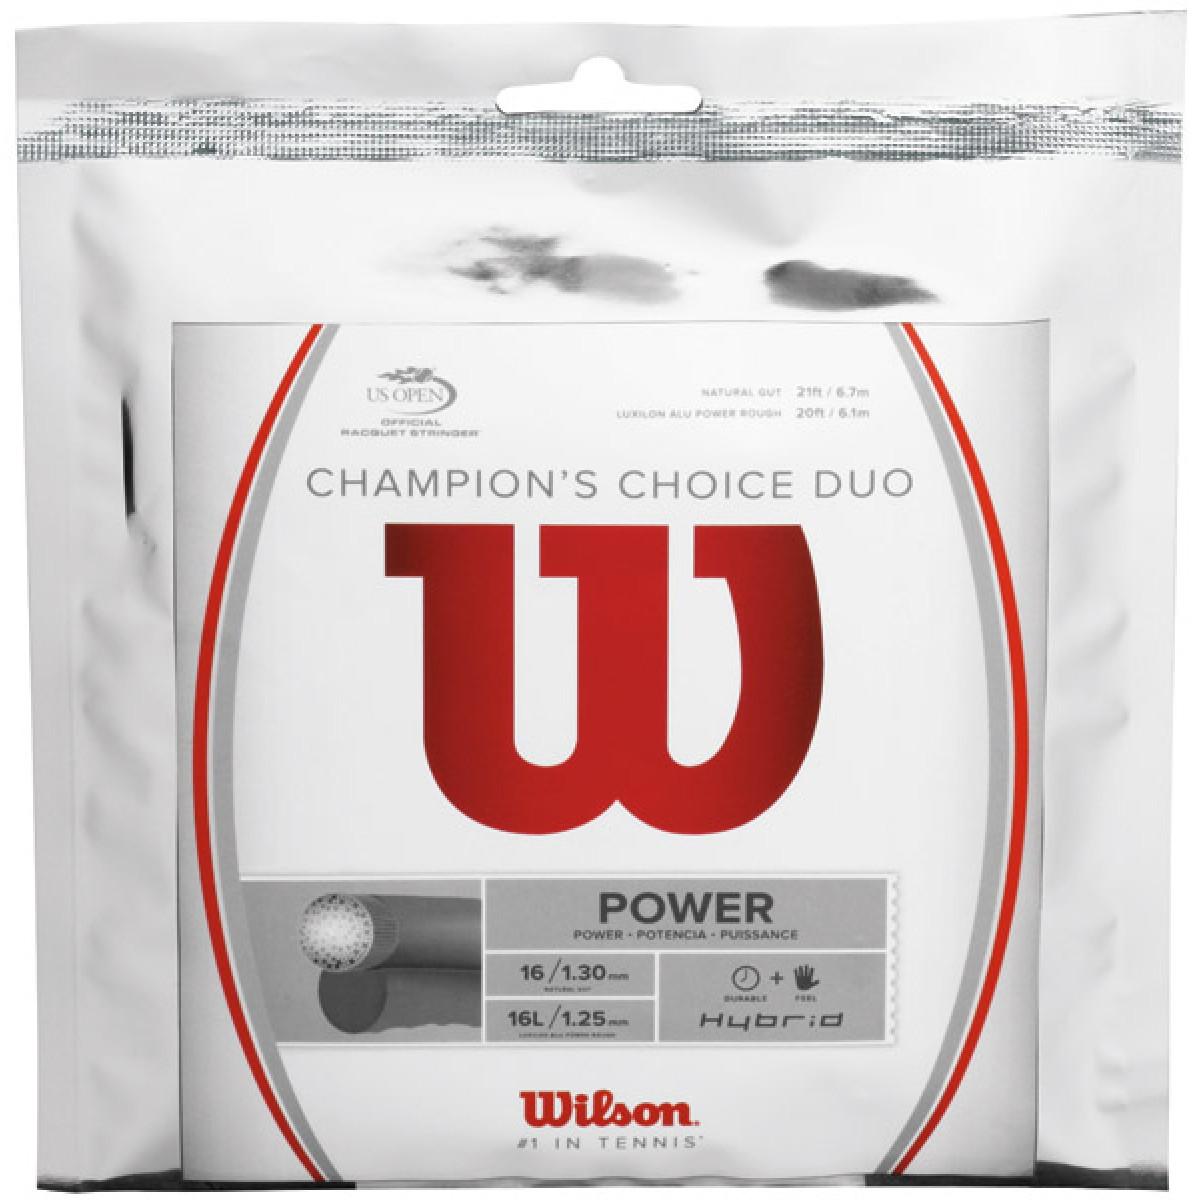 CORDAGE WILSON CHAMPION'S CHOICE DUO